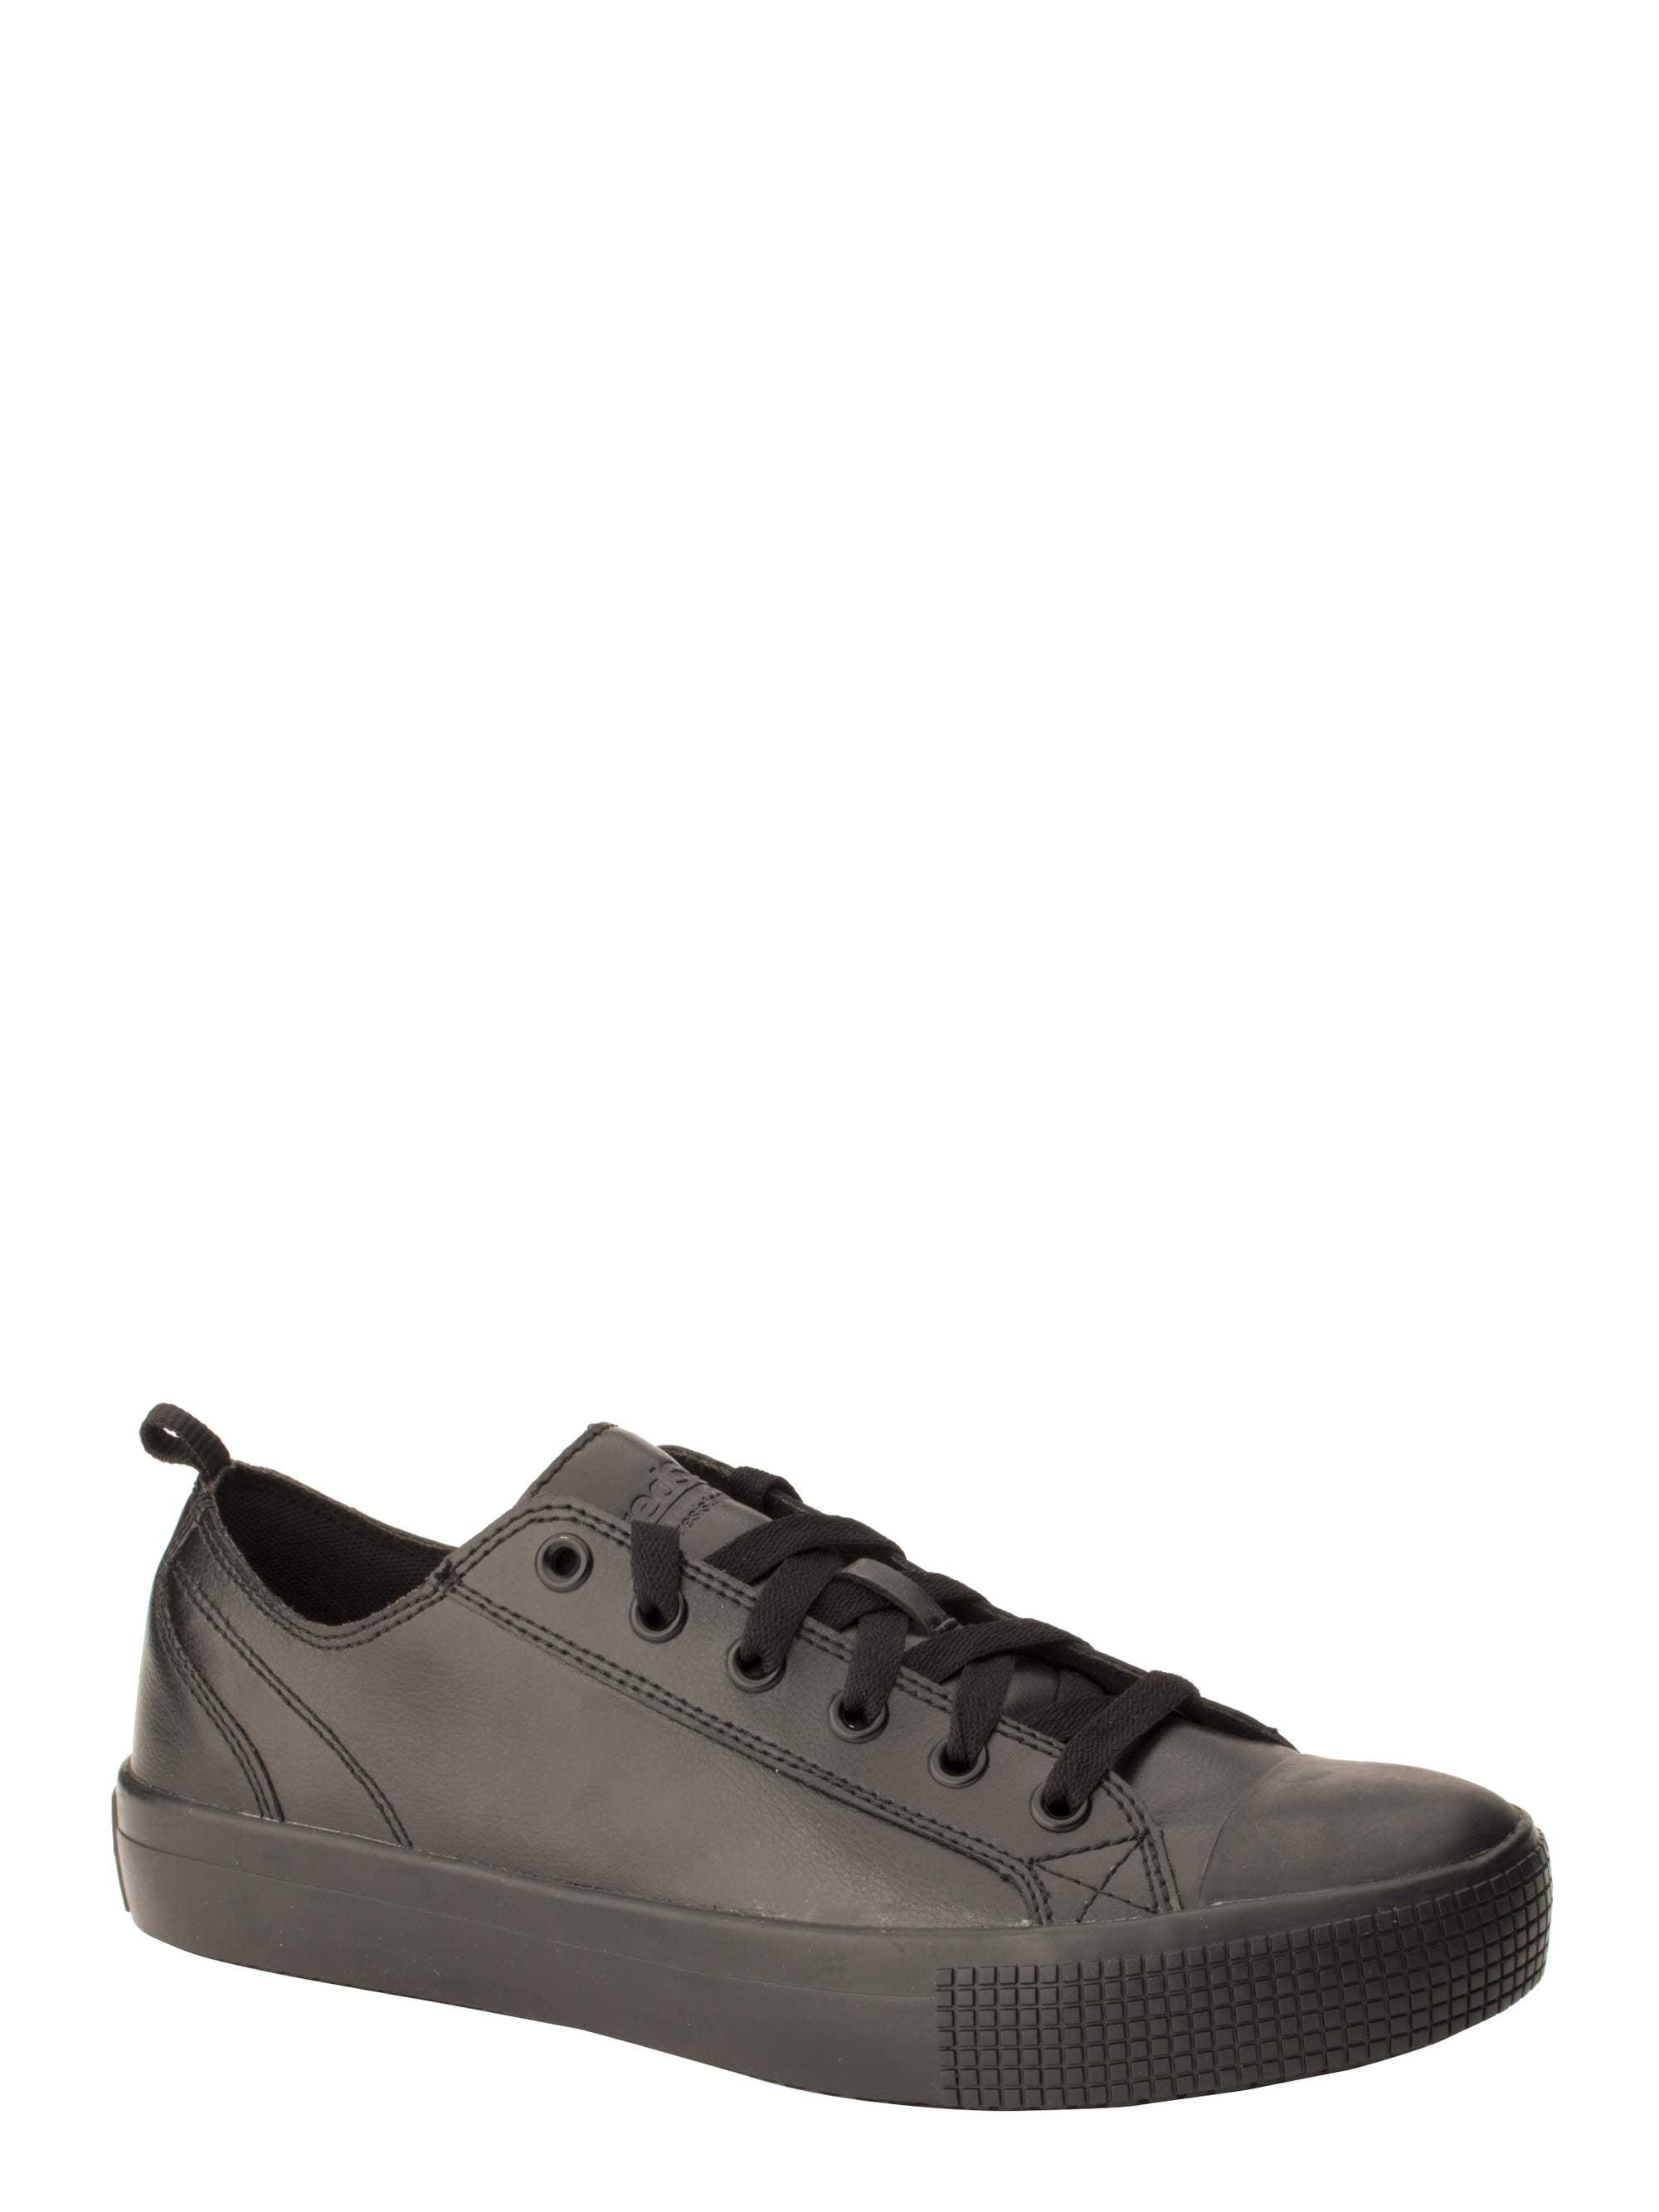 Tredsafe kitch unisex work shoes pic 65